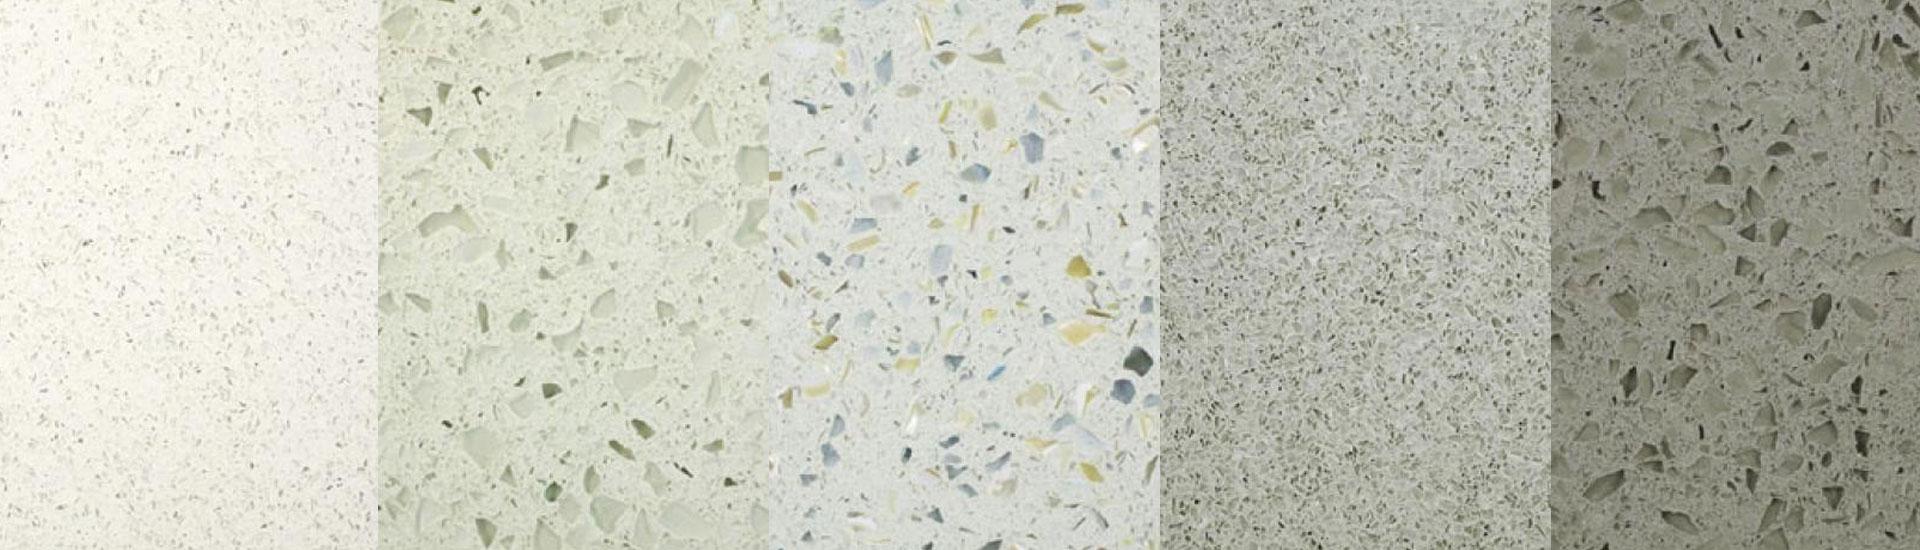 IceStone3-1920x550